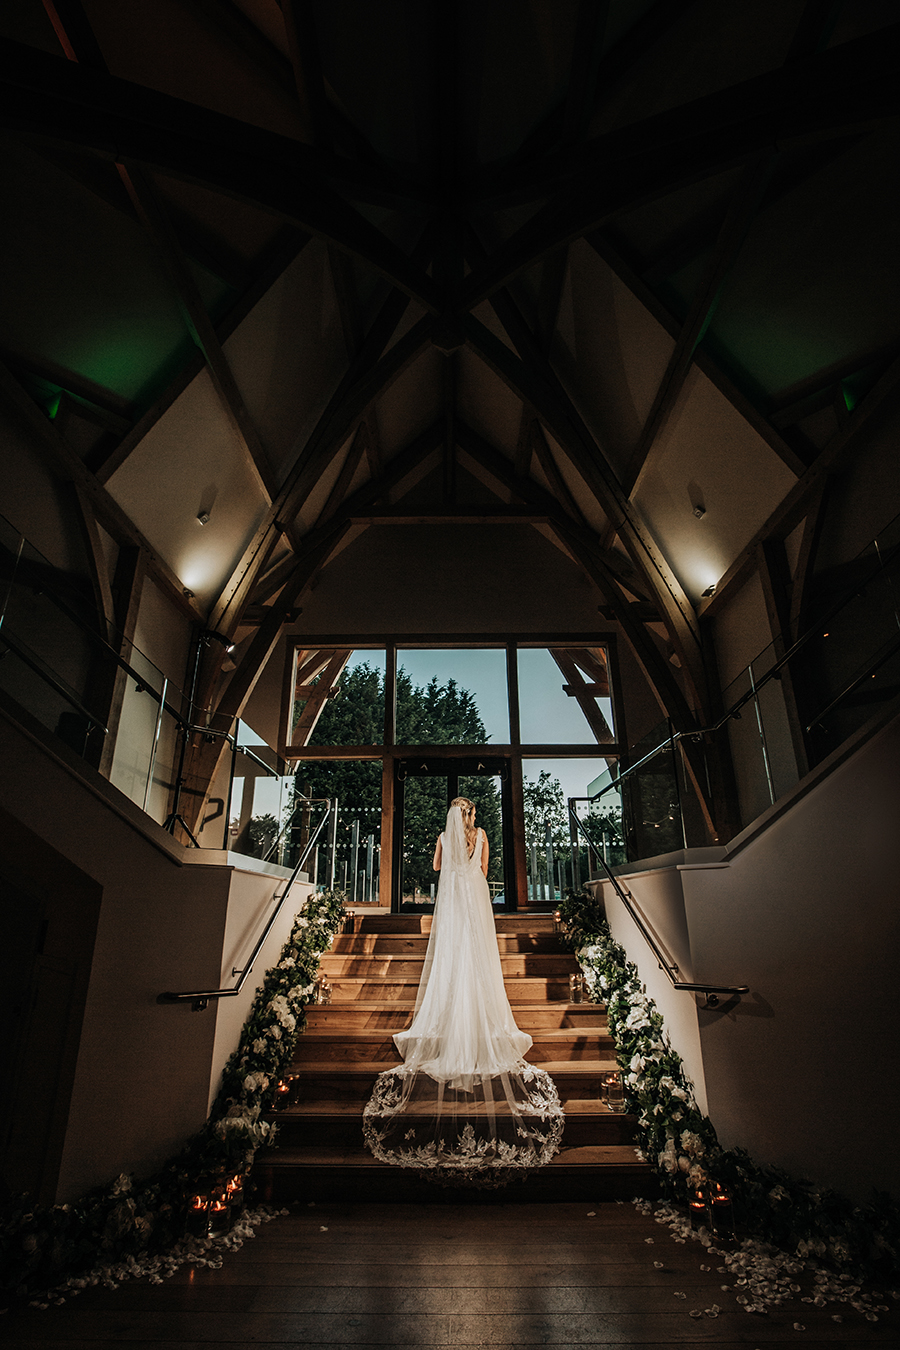 Laura & Dan's beautifully elegant wedding at Mill Barns Alveley, image credit Stott Weddings (39)